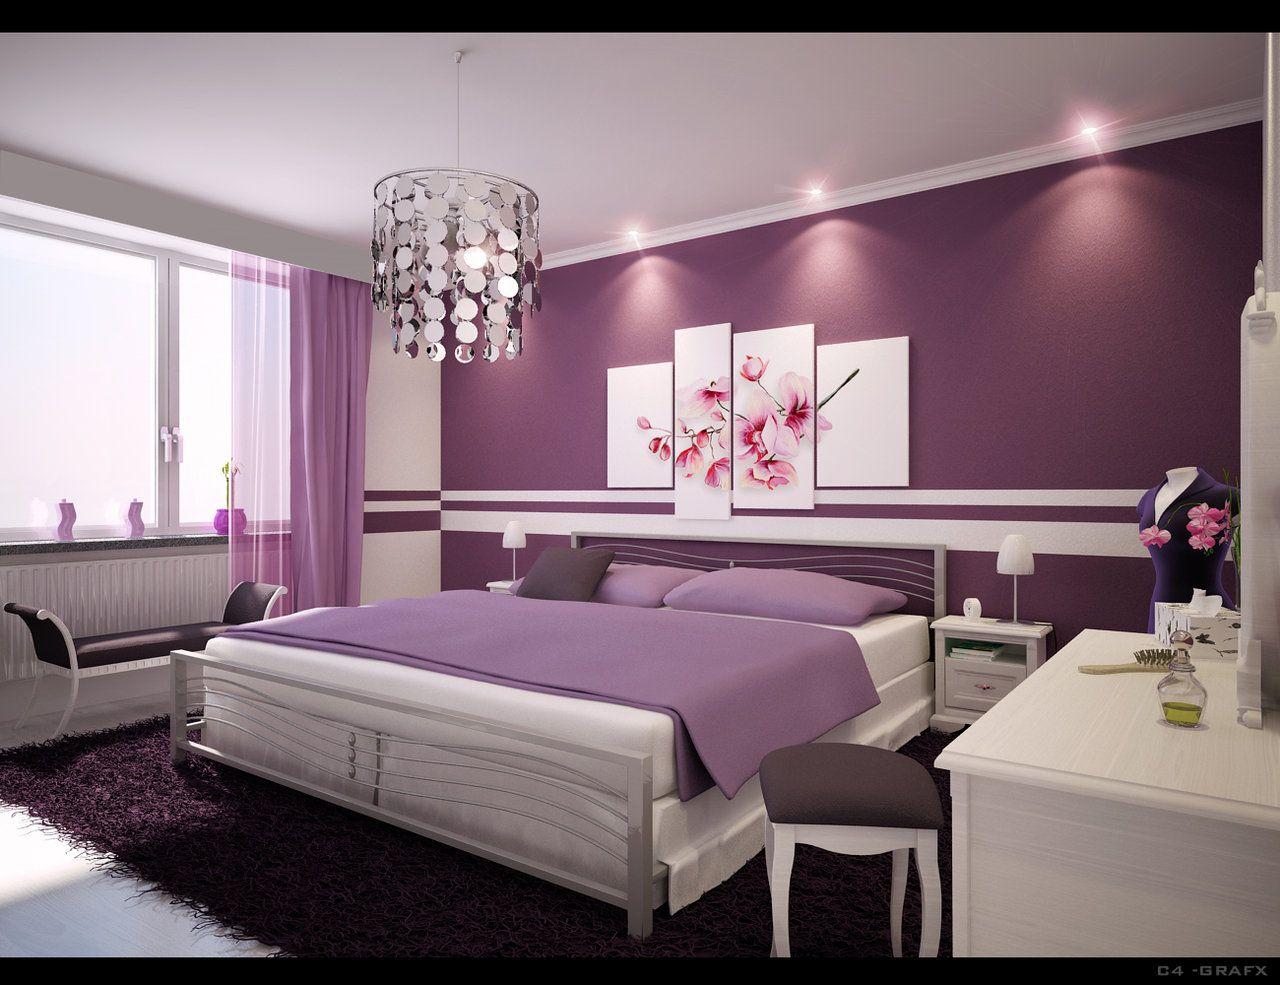 Luxury Wall Decoration For Bedroom Decor | Bedroom Decor ...